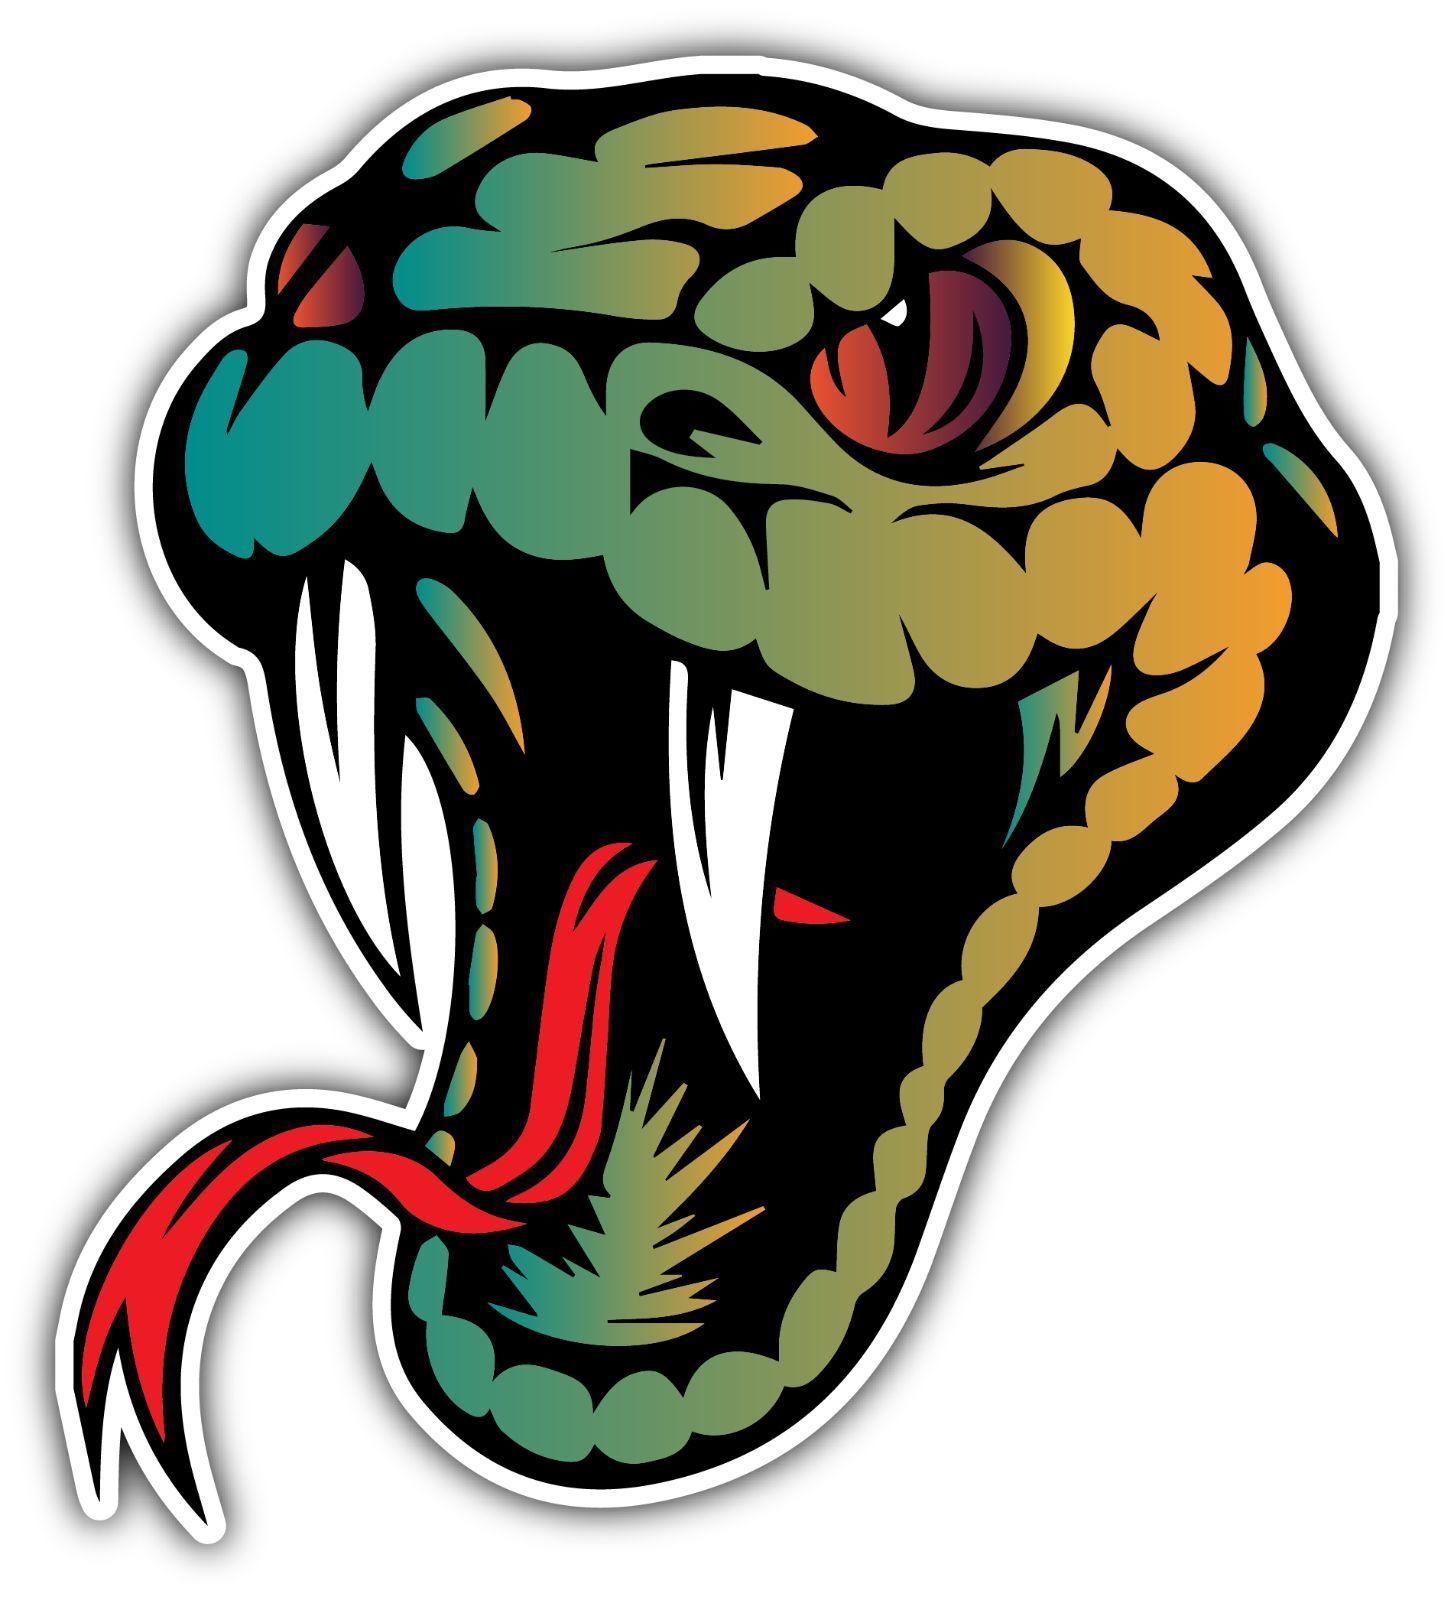 Snake Head Reptiles Lizard Viper Venom Bumper Window Vinyl Sticker Decal 4 X5 Stickers Vinyl Sticker Window Vinyl [ jpg ]